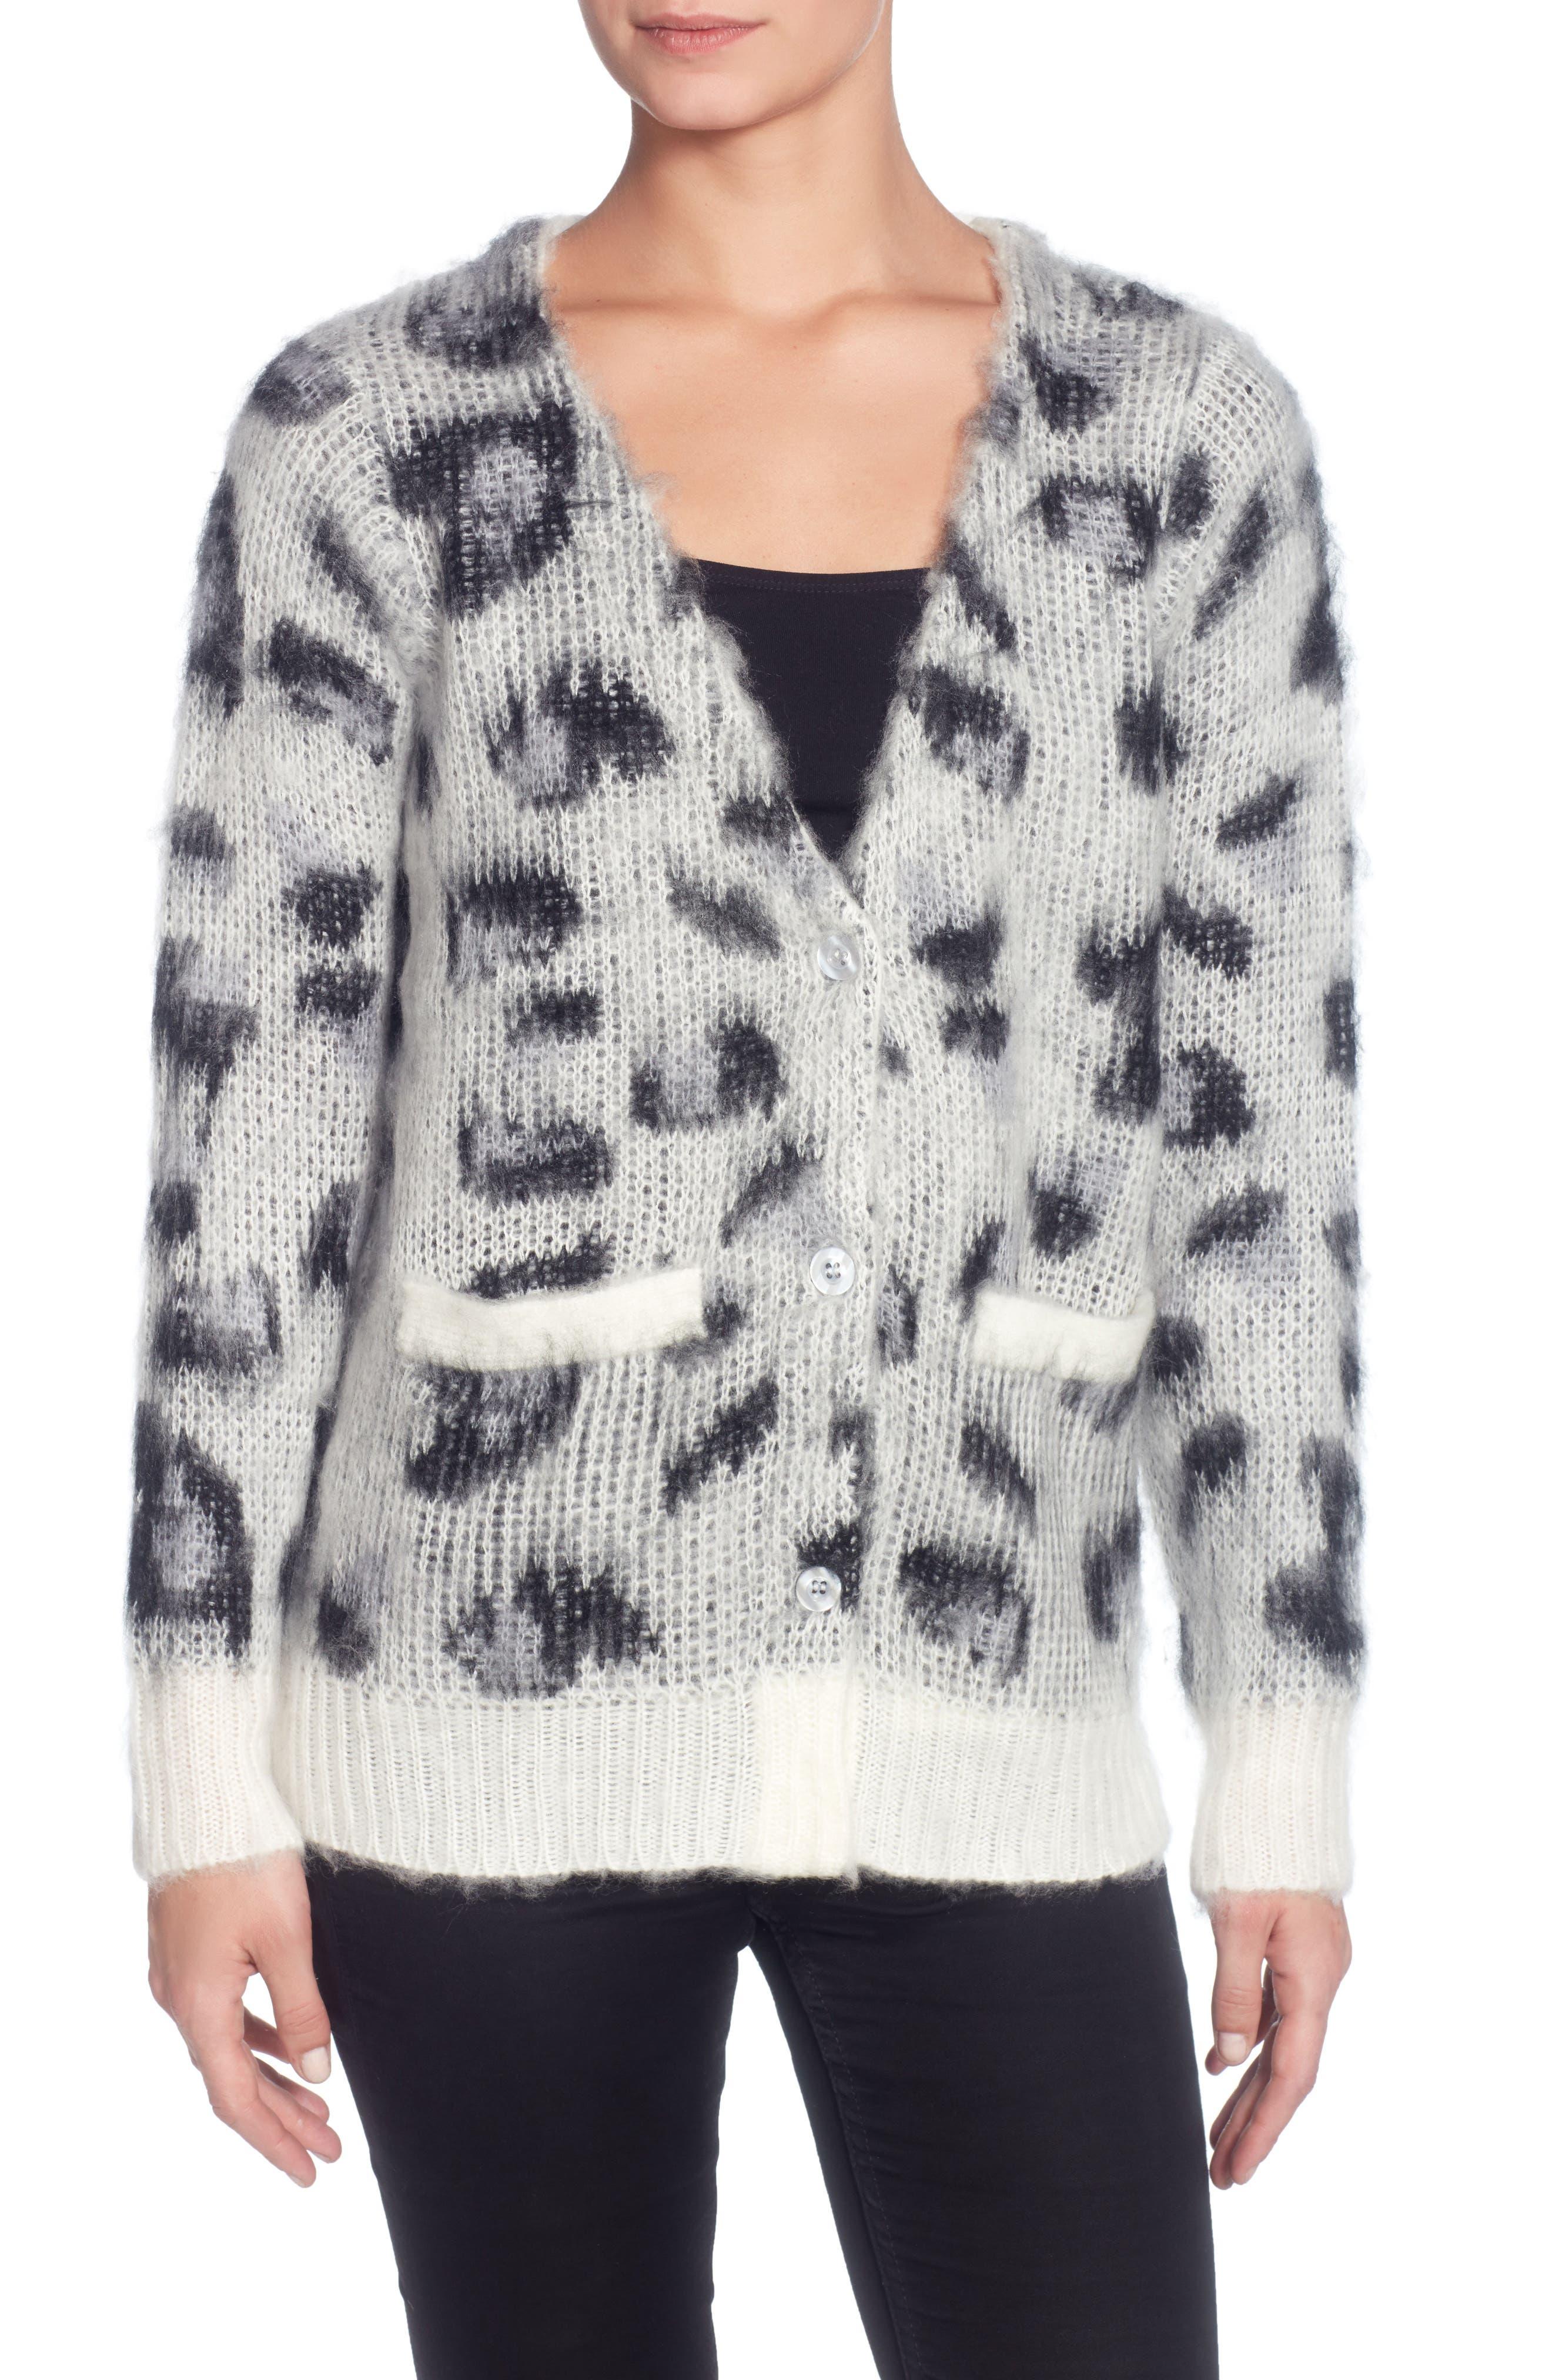 Leopard Cardigan,                         Main,                         color, Black/ Grey/ White